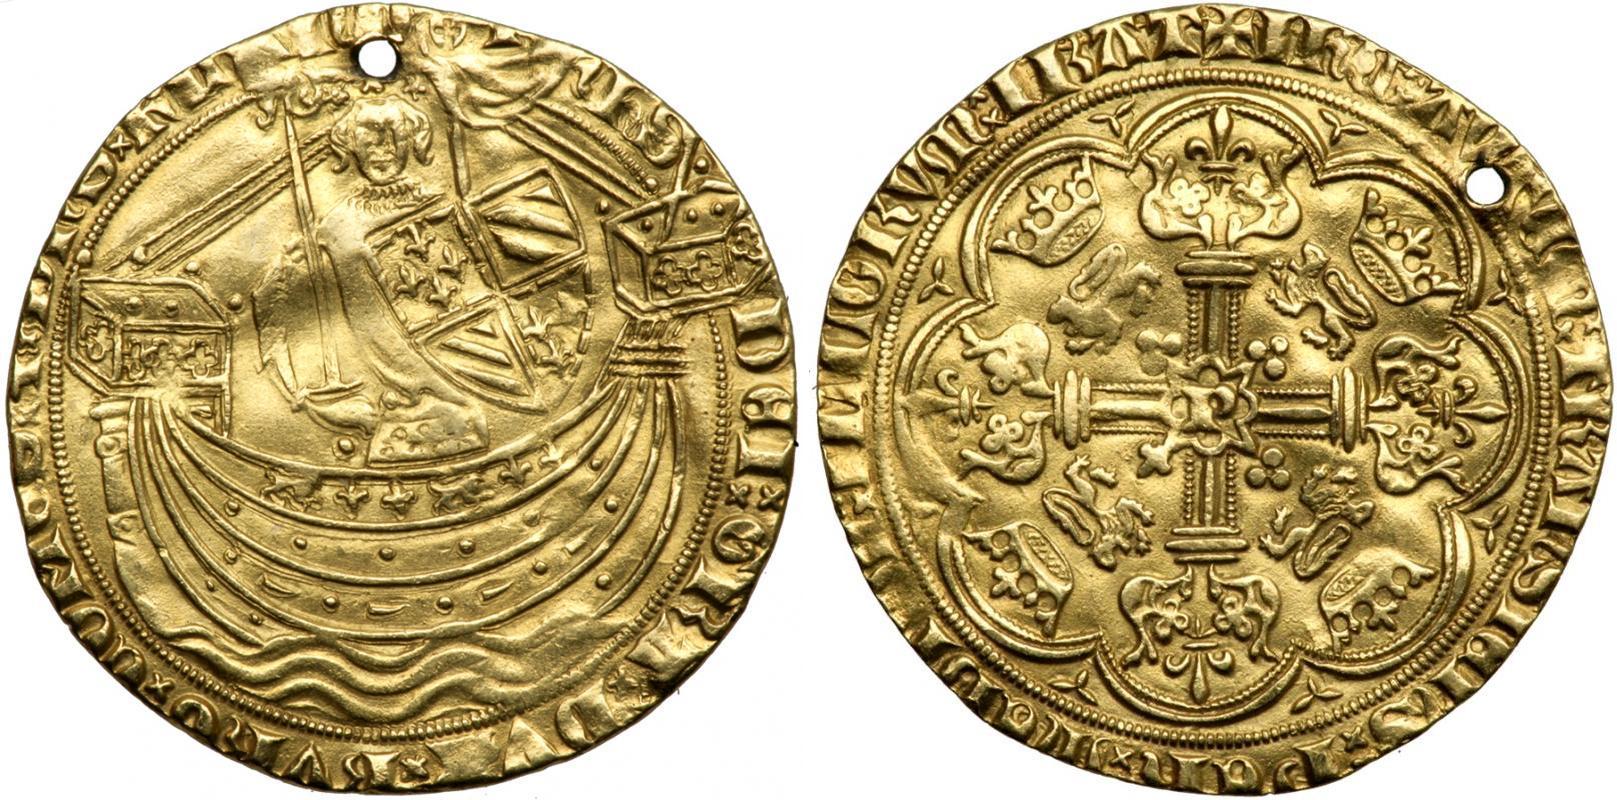 1 noble 1356 kingdom of england 927 1649 1660 1707 gold - Coin de finition plinthe ...